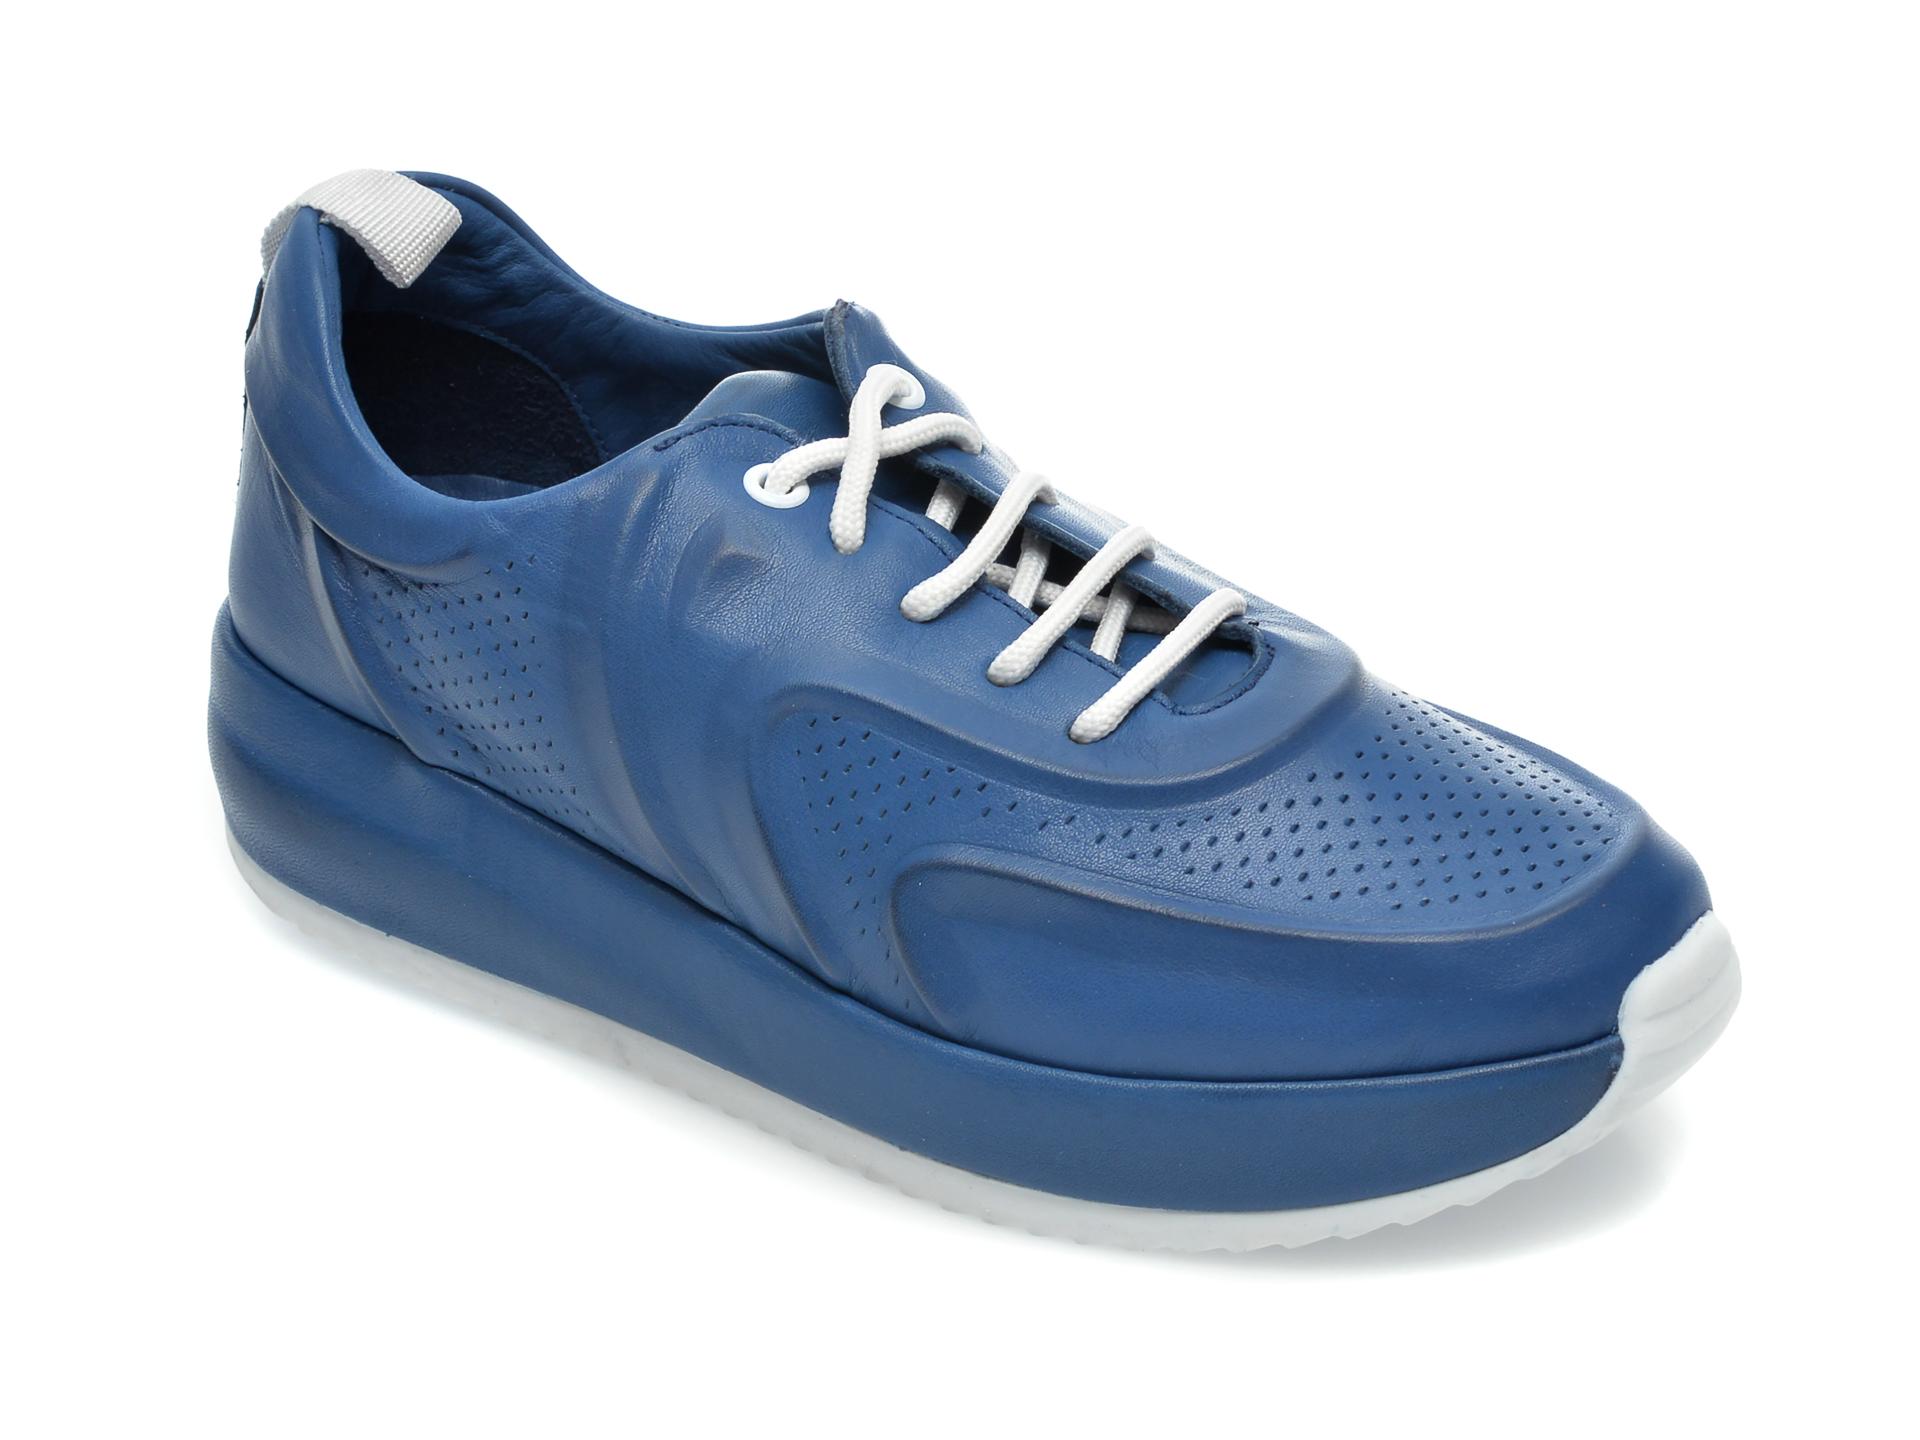 Pantofi Flavia Passini Albastri, 109078, Din Piele Naturala